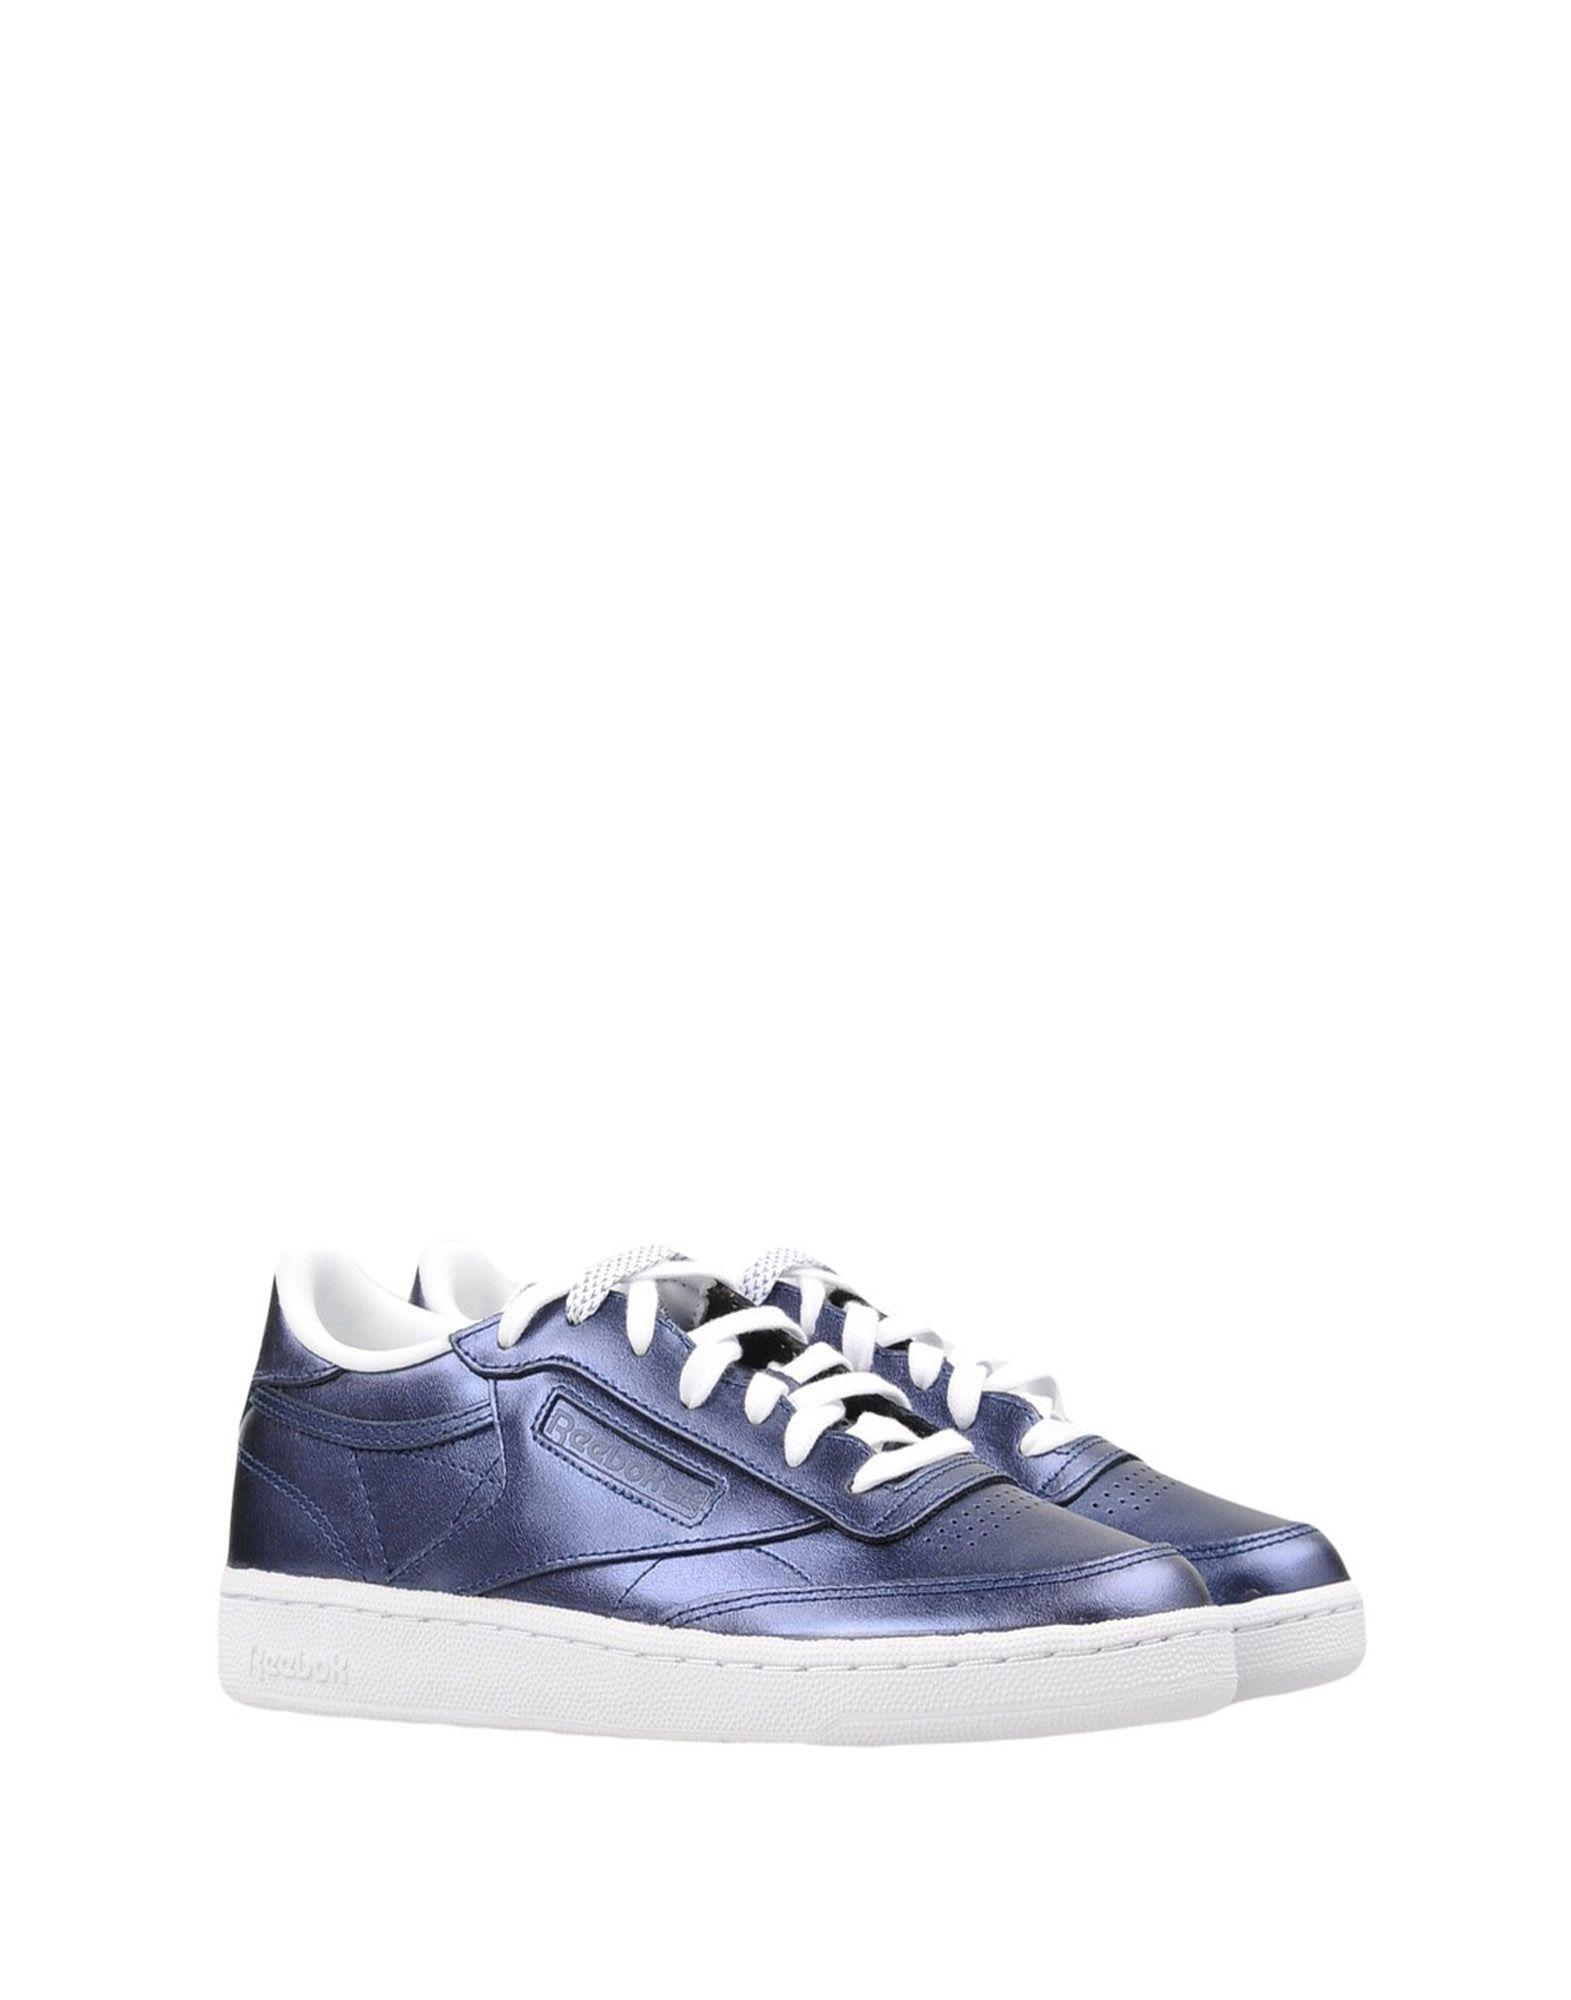 Sneakers Reebok Club C 85 S Shine - Femme - Sneakers Reebok sur